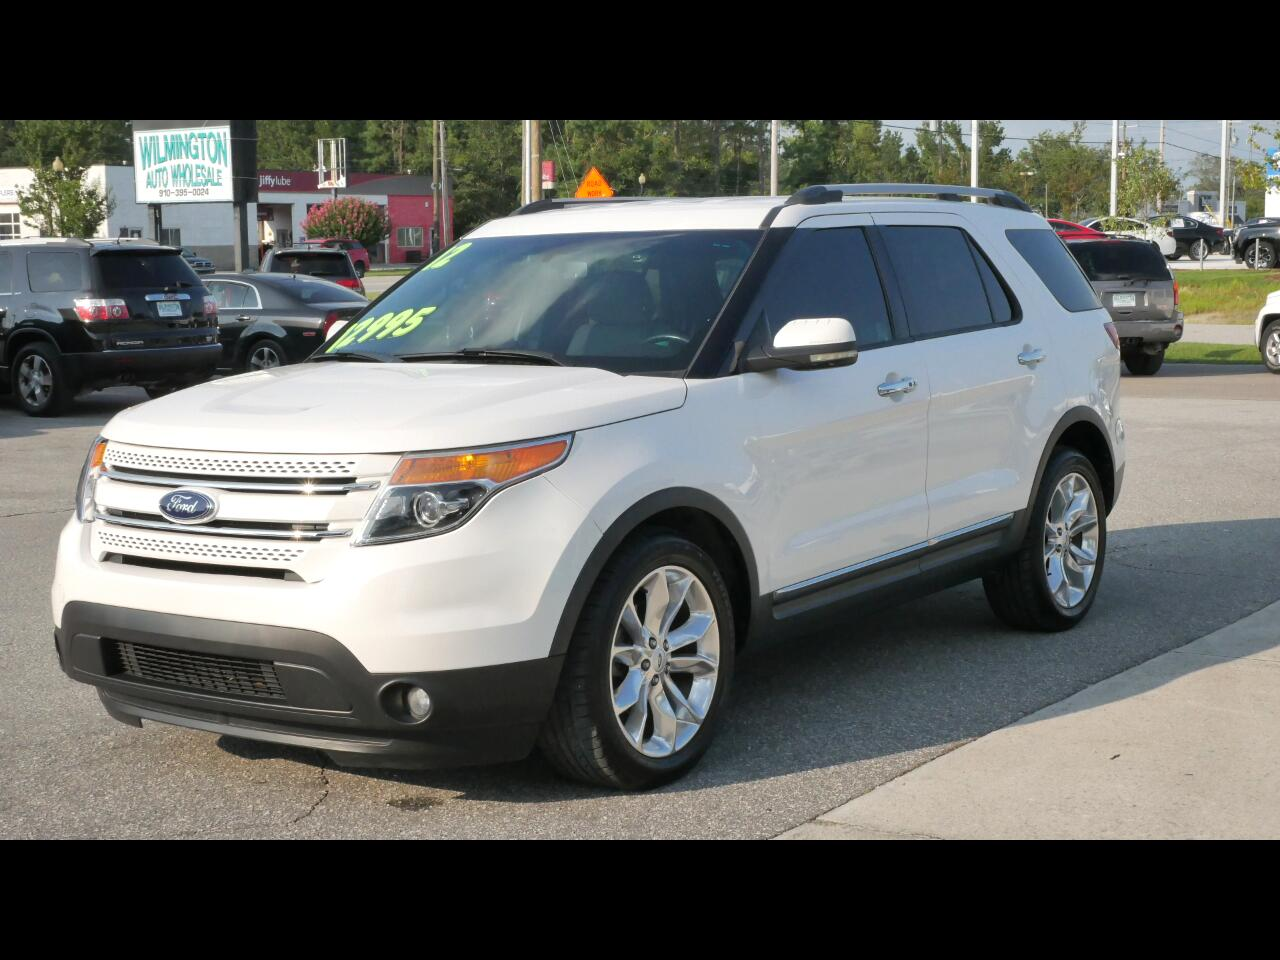 Ford Explorer FWD 4dr Limited 2012